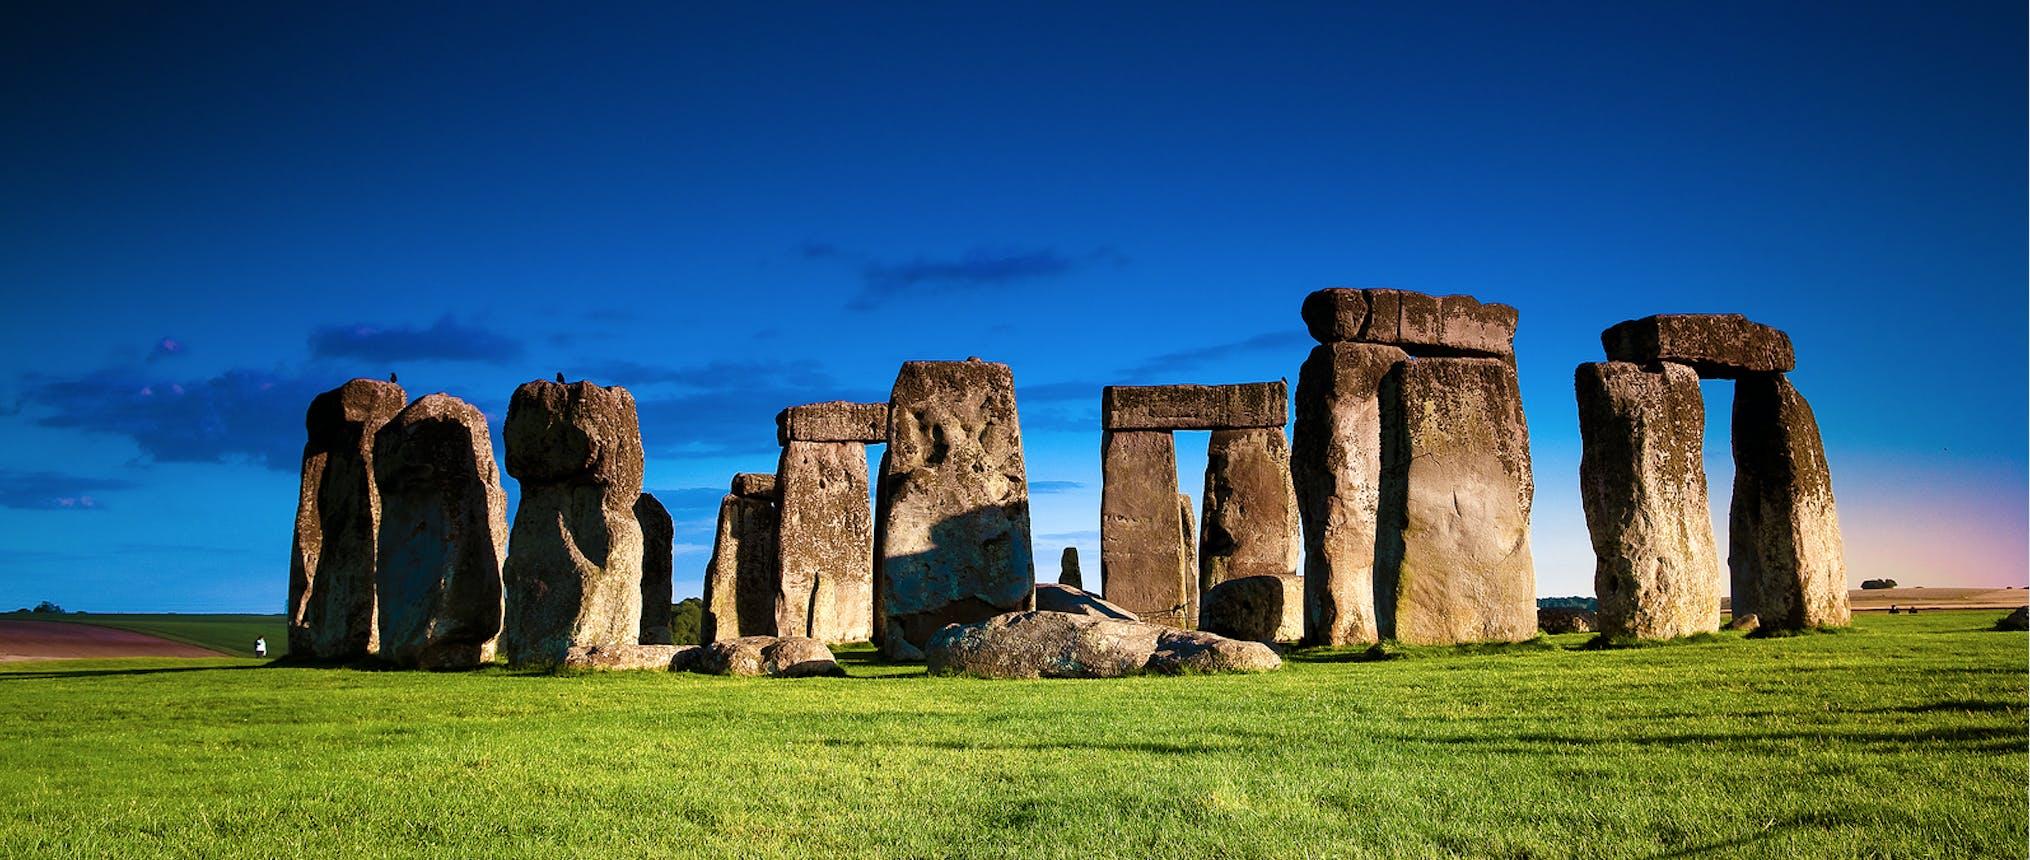 Ver la ciudad,City tours,Ver la ciudad,City tours,Visitas en autobús,Bus tours,Tours históricos y culturales,Historical & Cultural tours,Sólo Stonehenge,Excursión a Stonehenge,Stonhenge and Bath